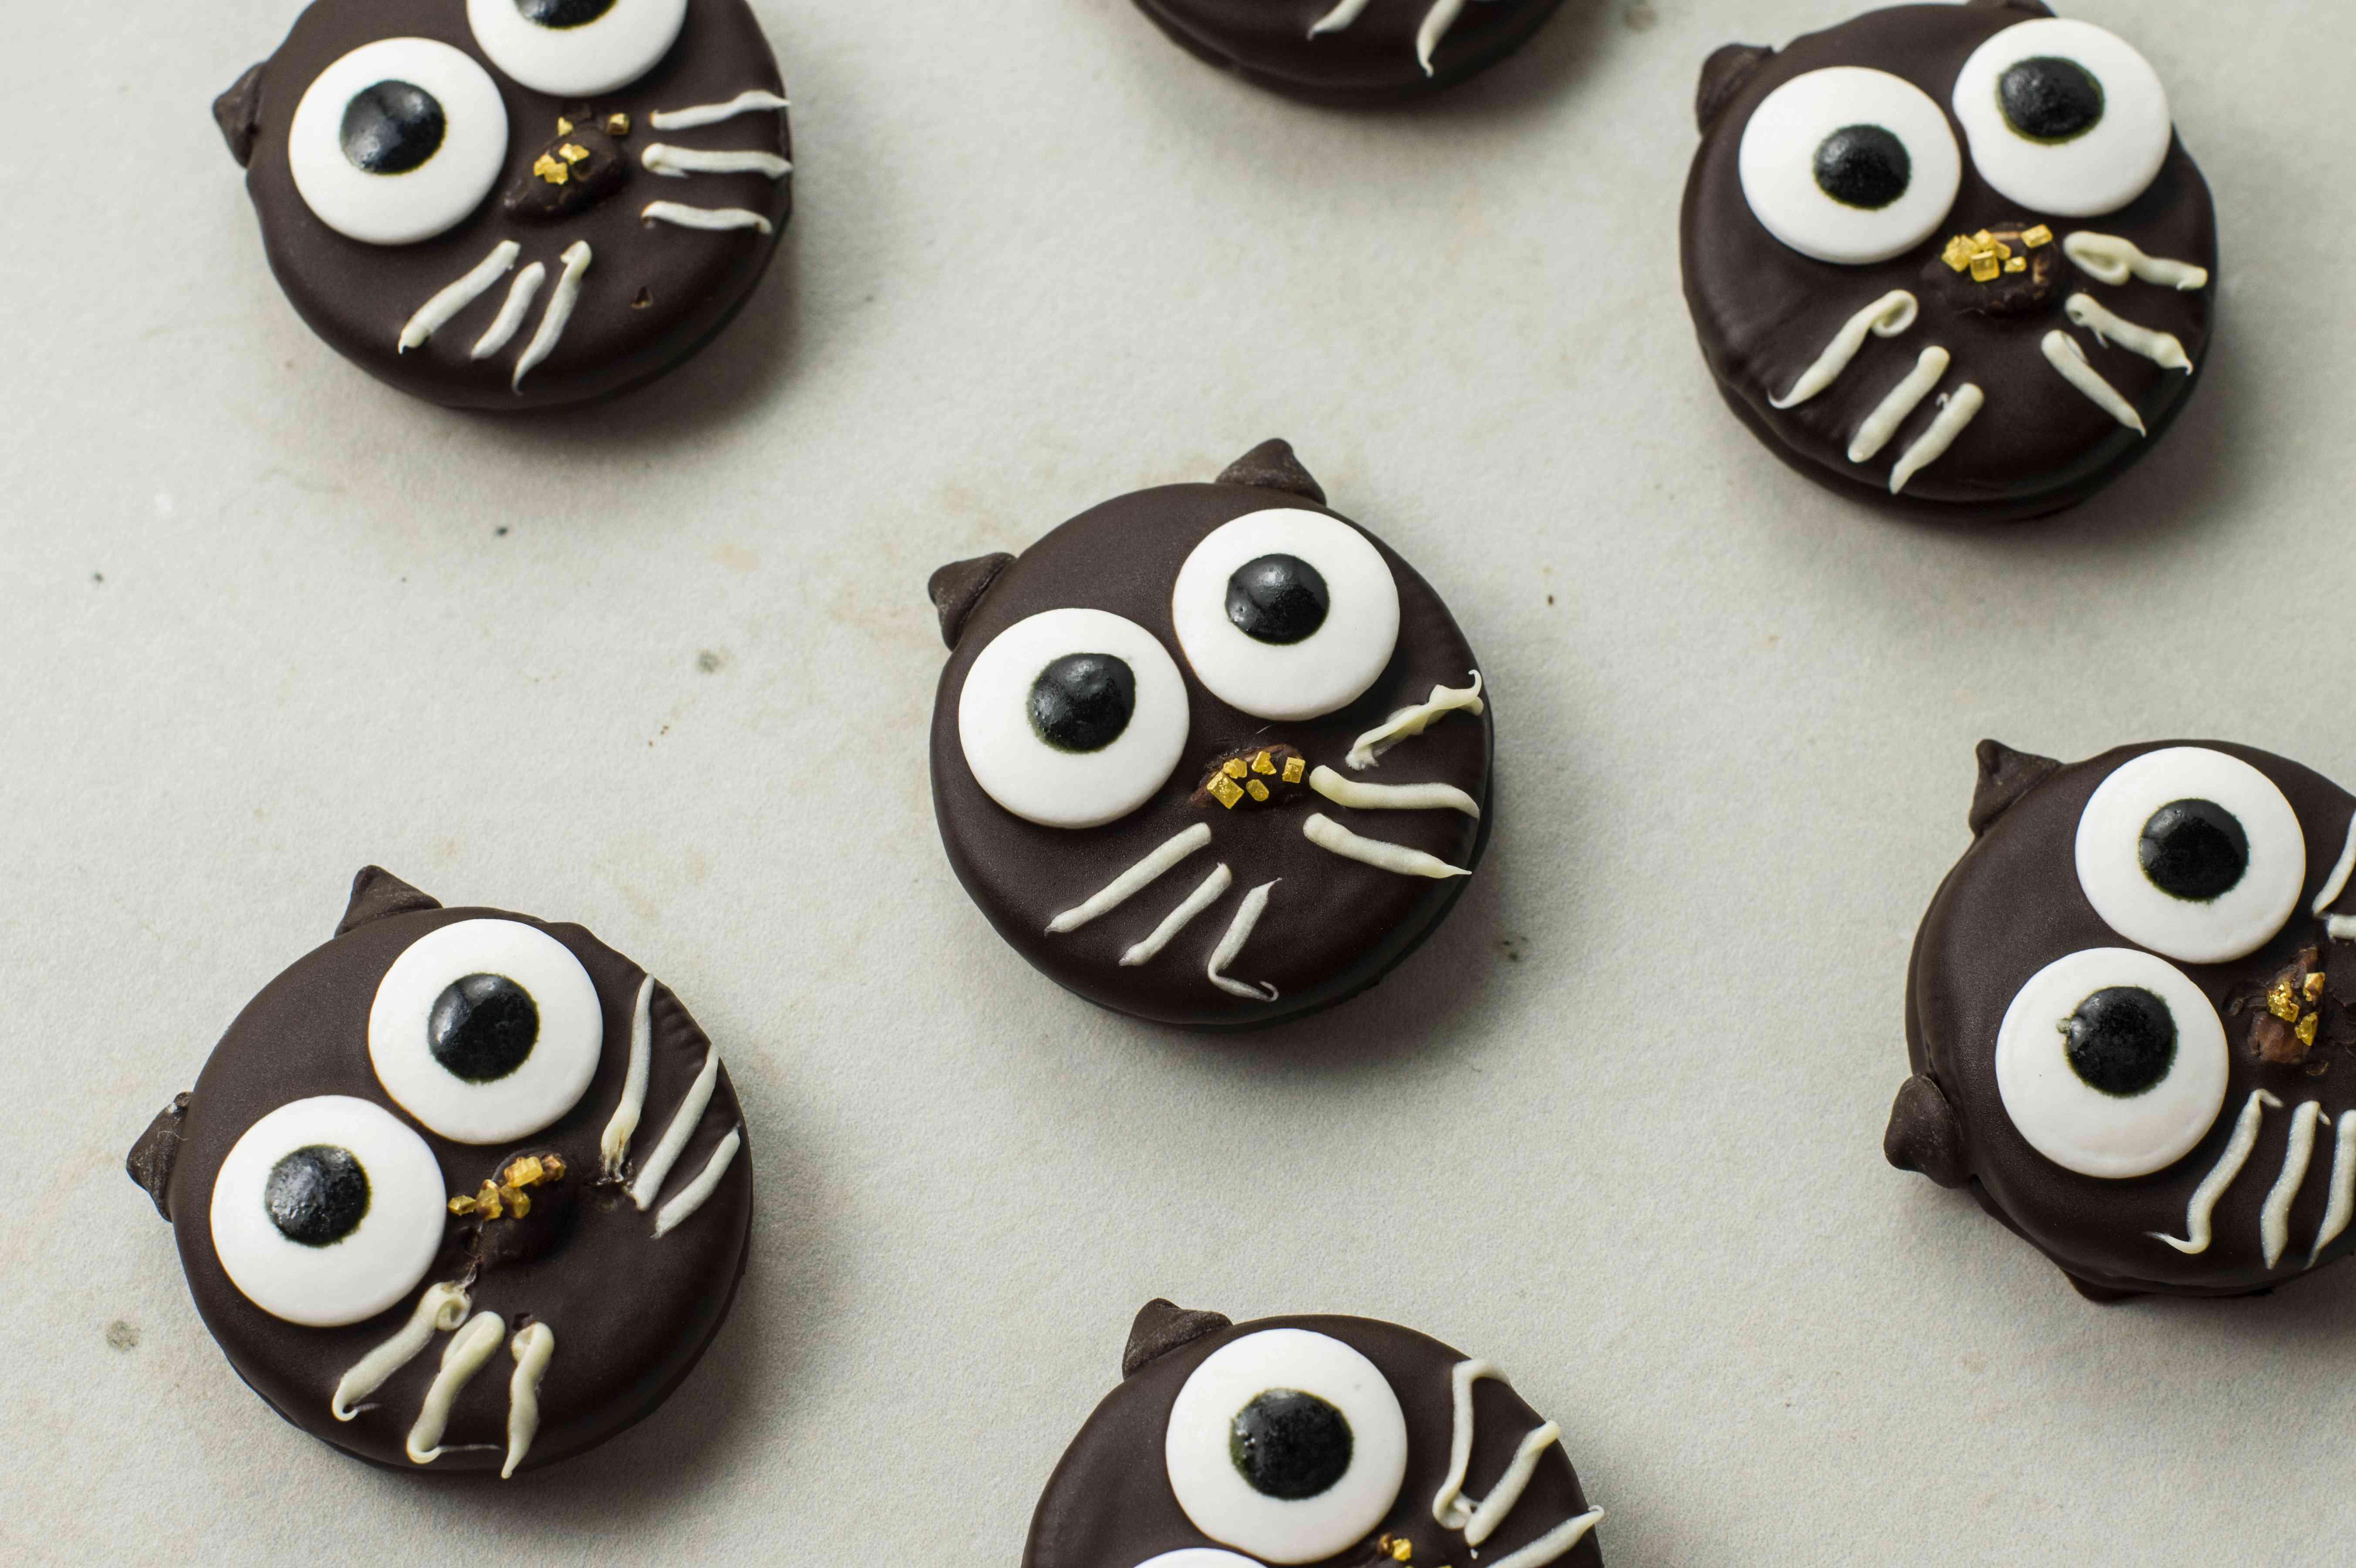 Black cat chocolate dipped cookie recipe